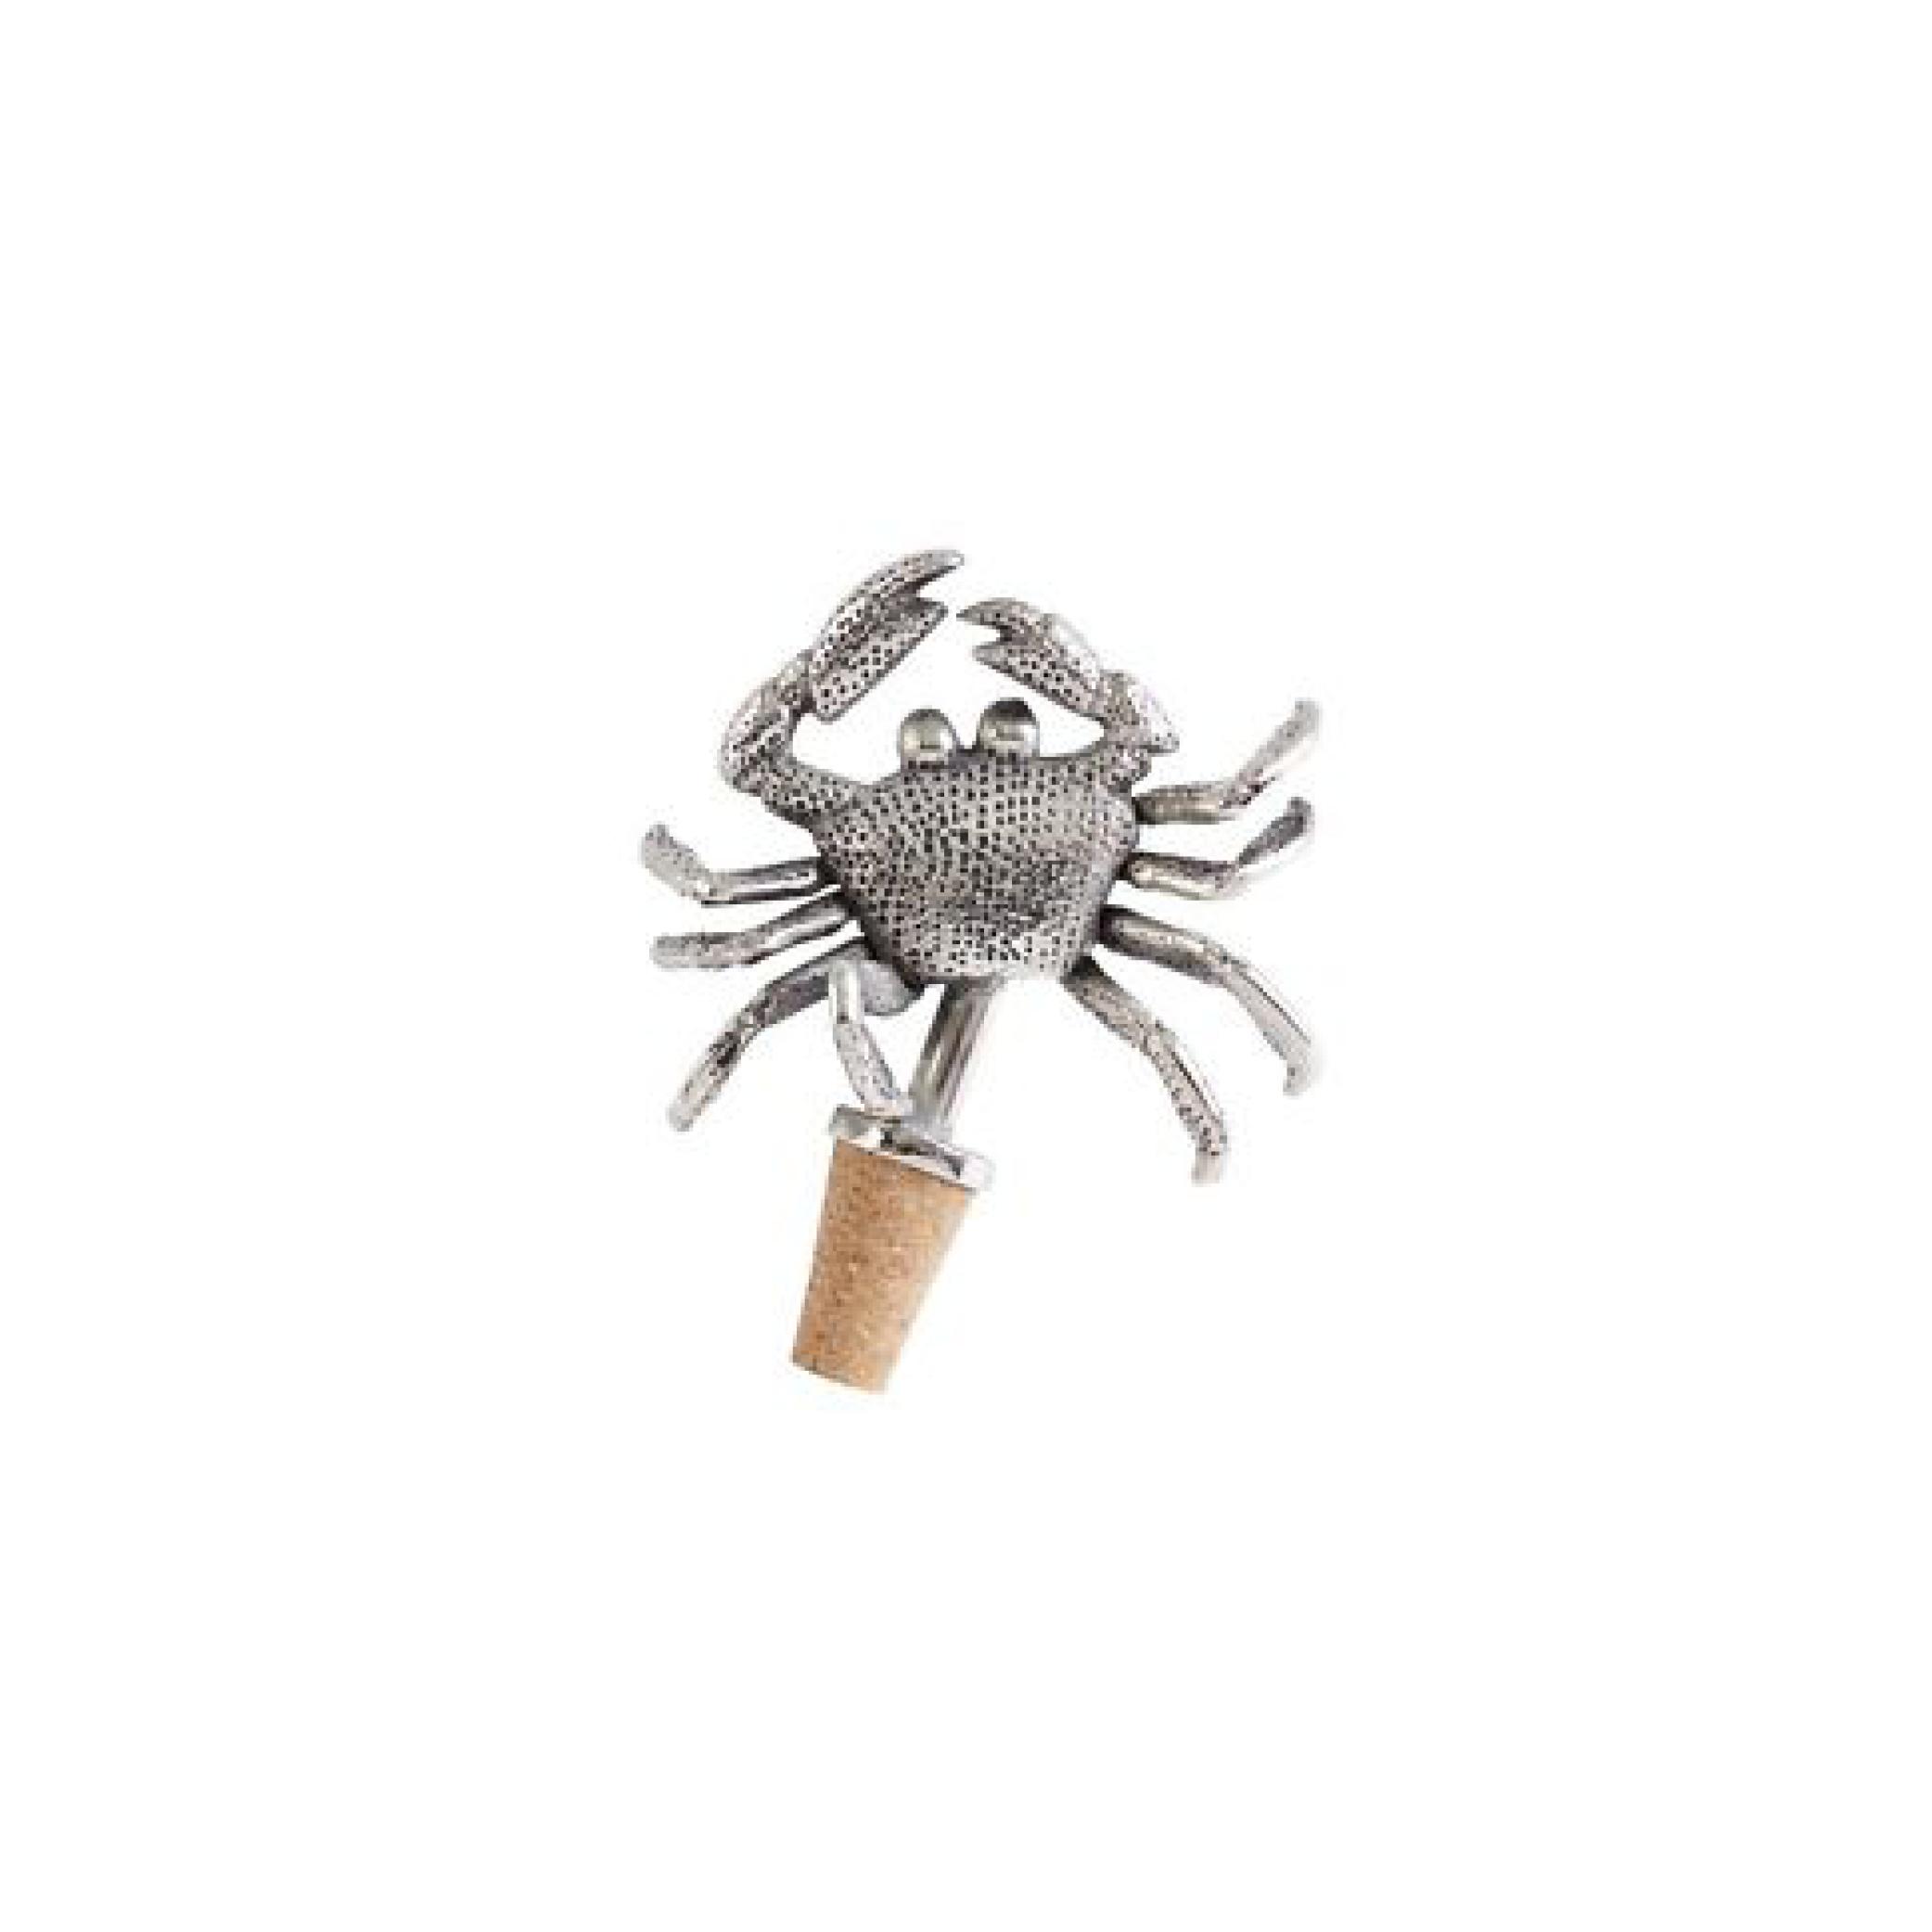 Mudpie Crab Bottle Topper $15.95   Wants 1 Has 0 Needs 1